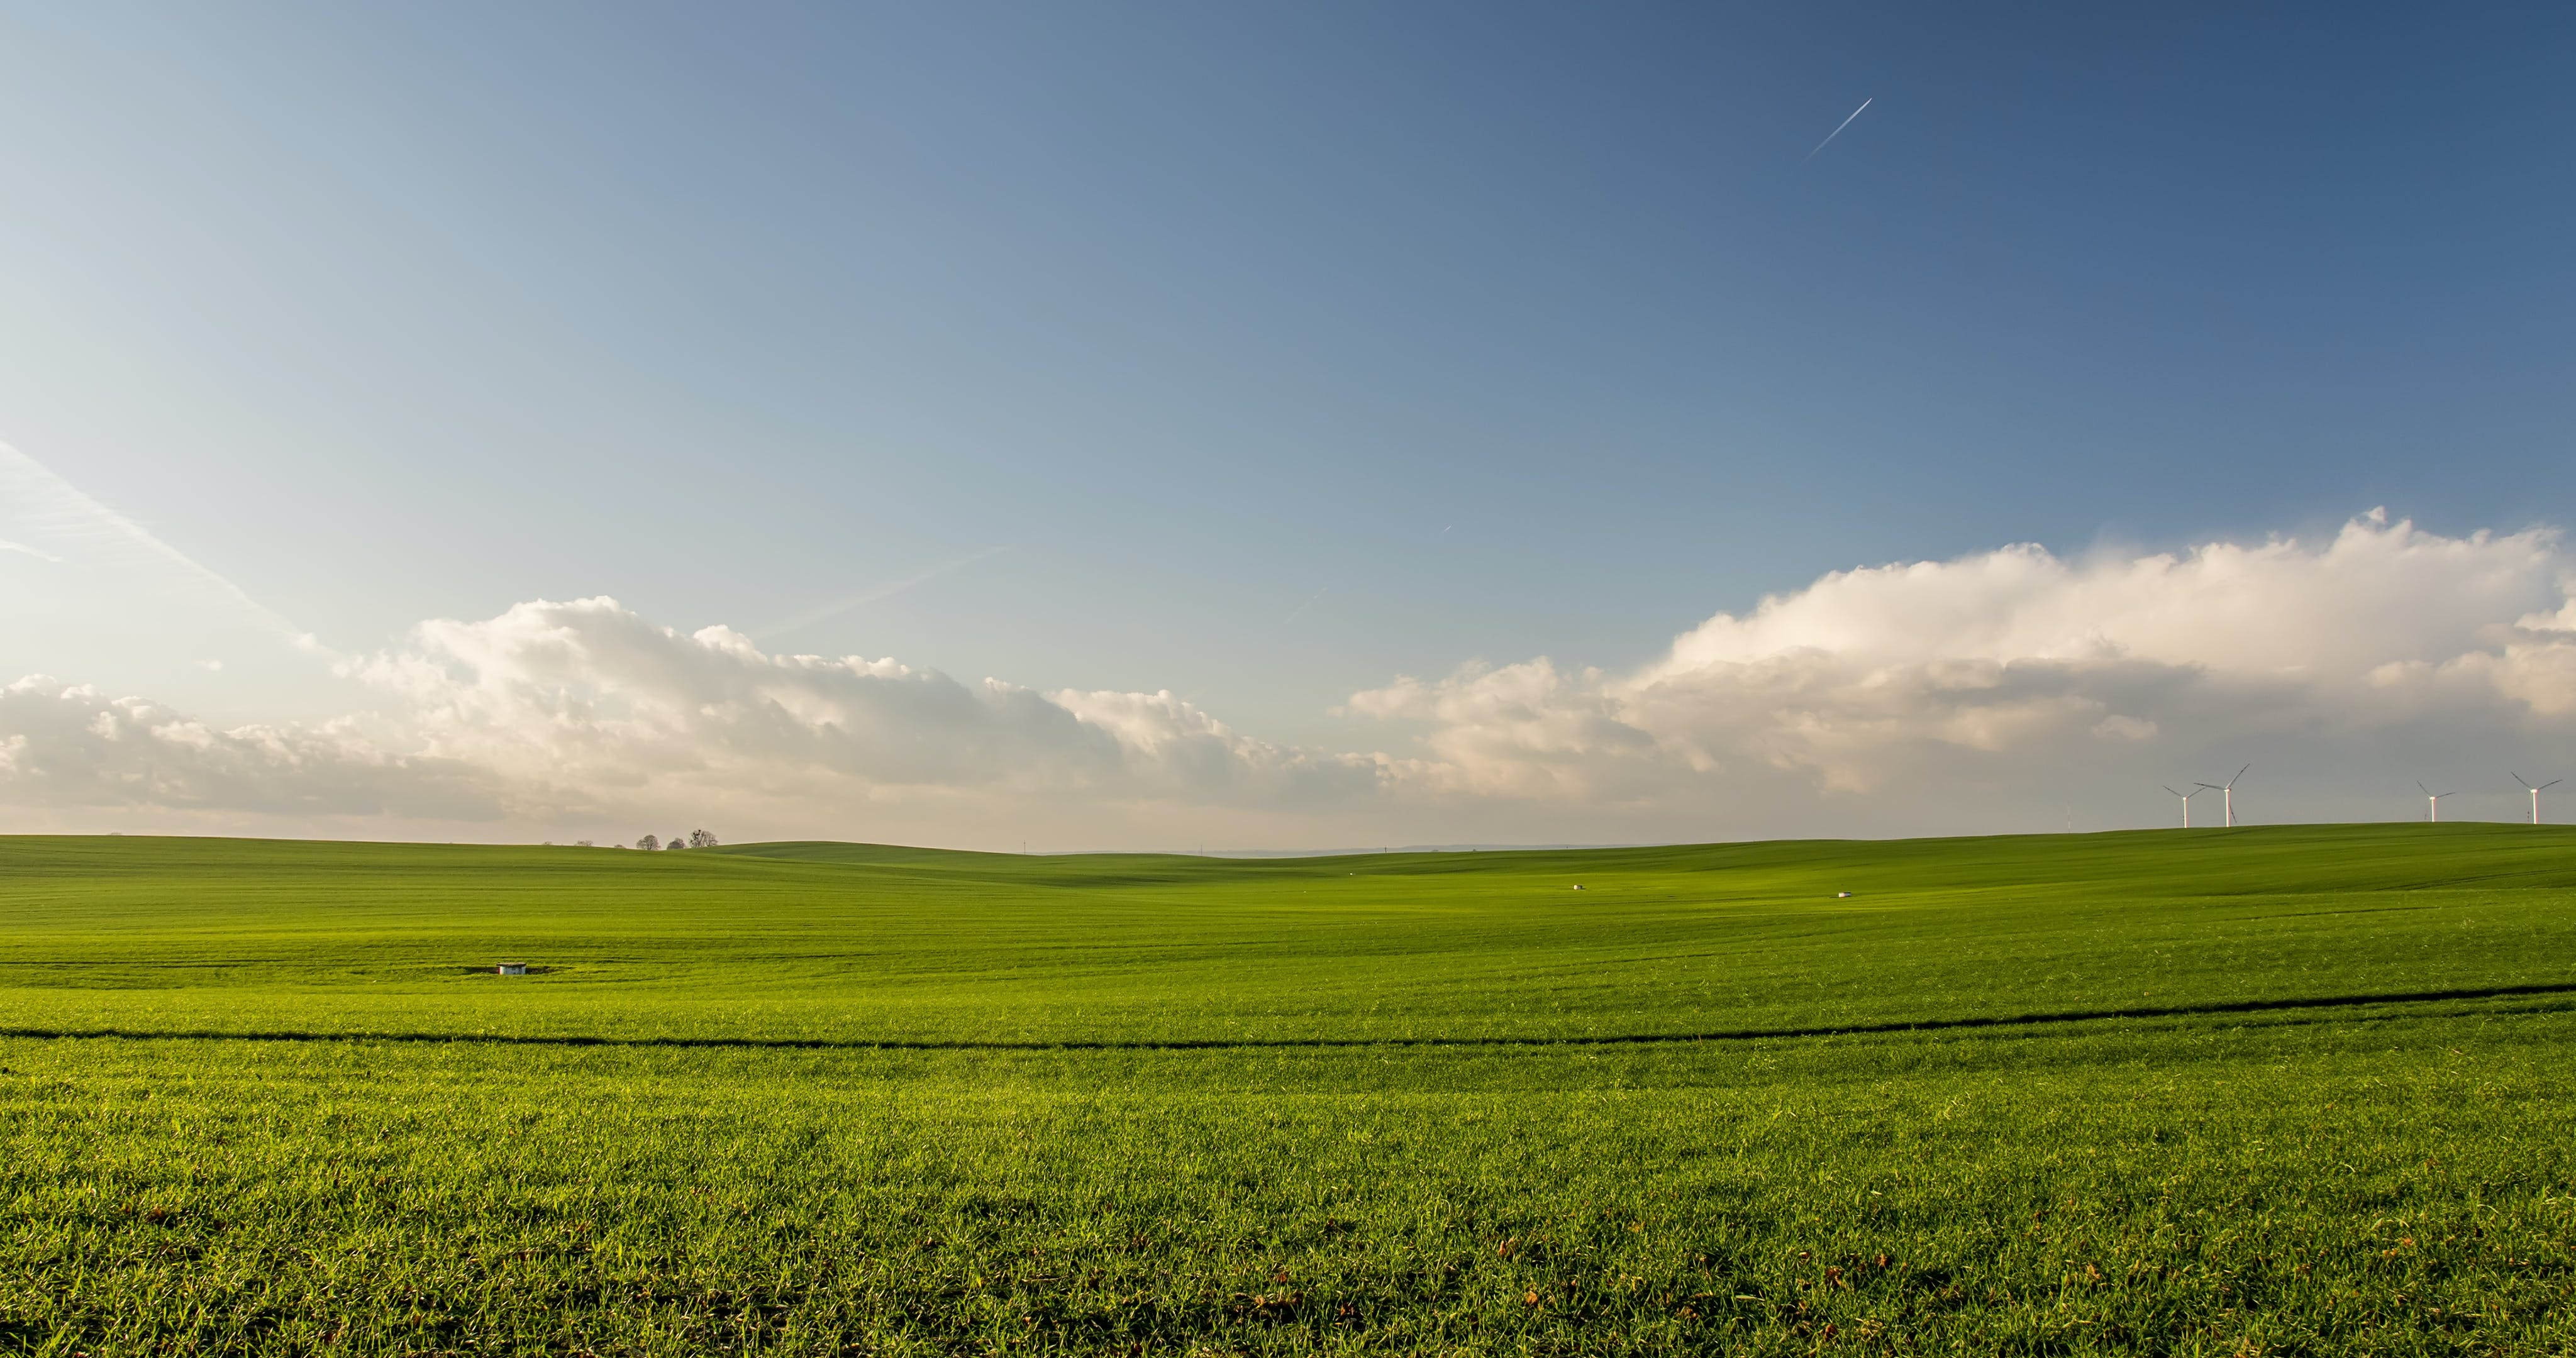 błękitne niebo, chmury, gospodarstwo